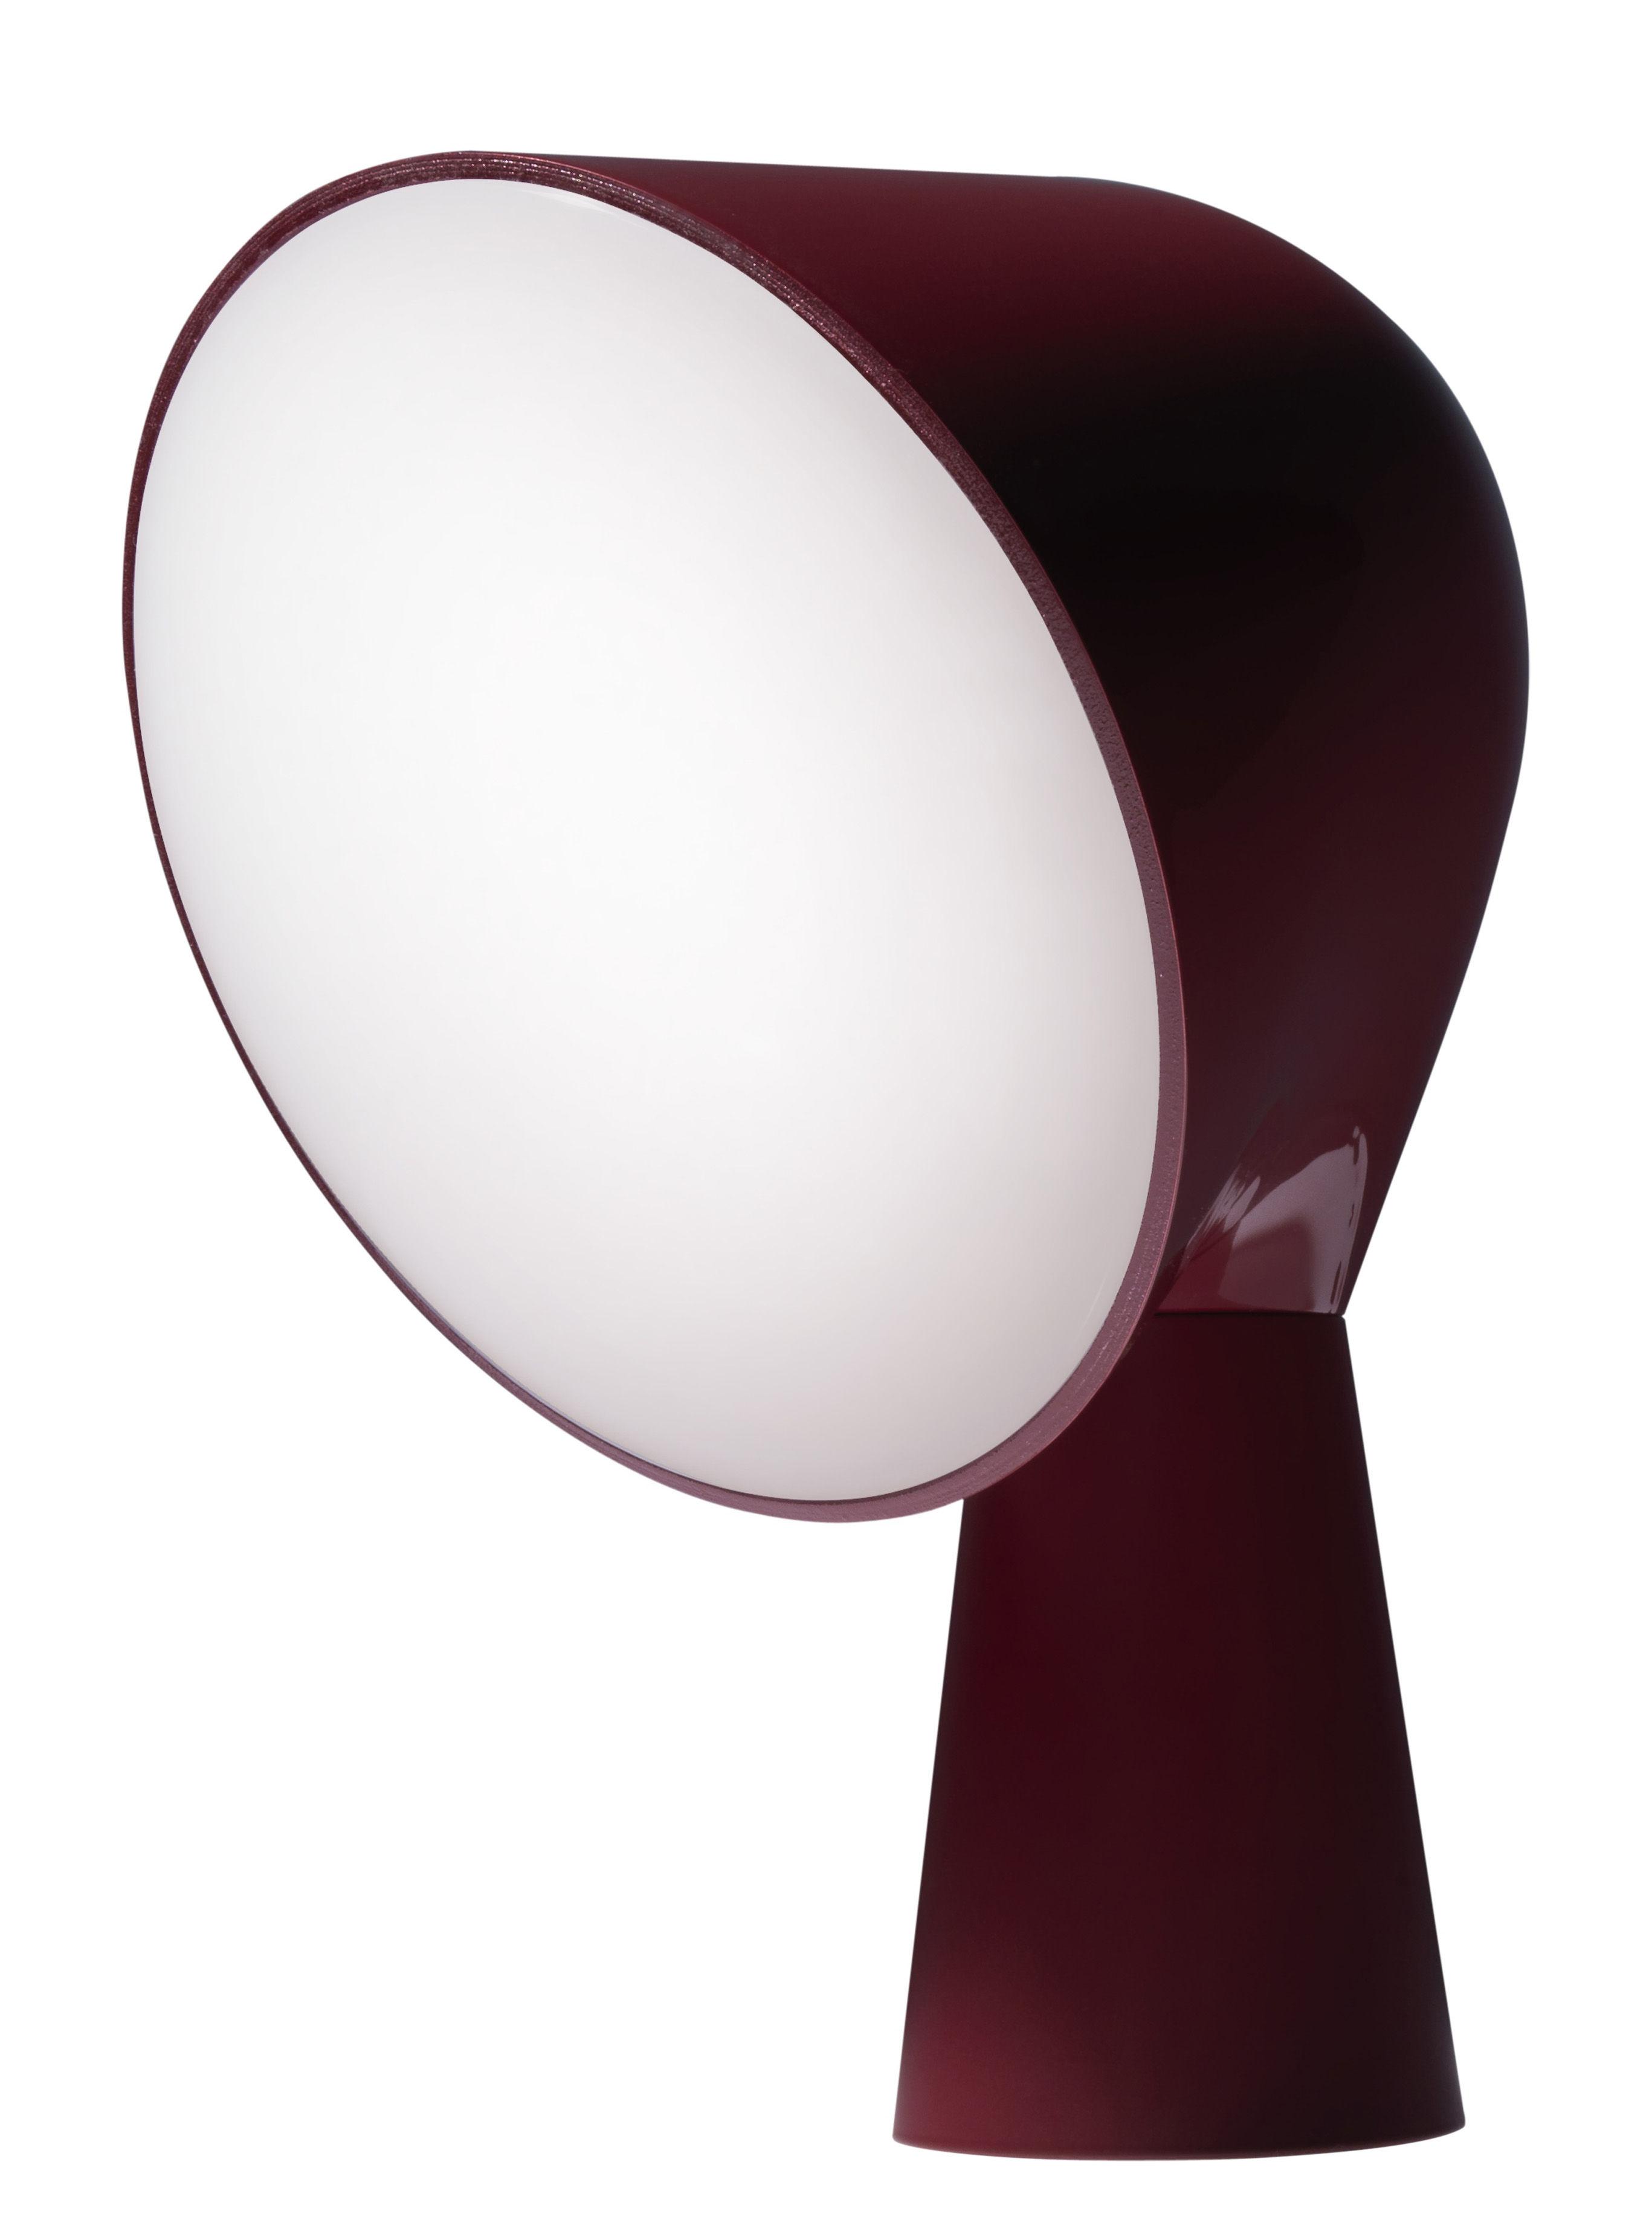 Luminaire - Lampes de table - Lampe de table Binic - Foscarini - Rouge amarante - ABS, Polycarbonate